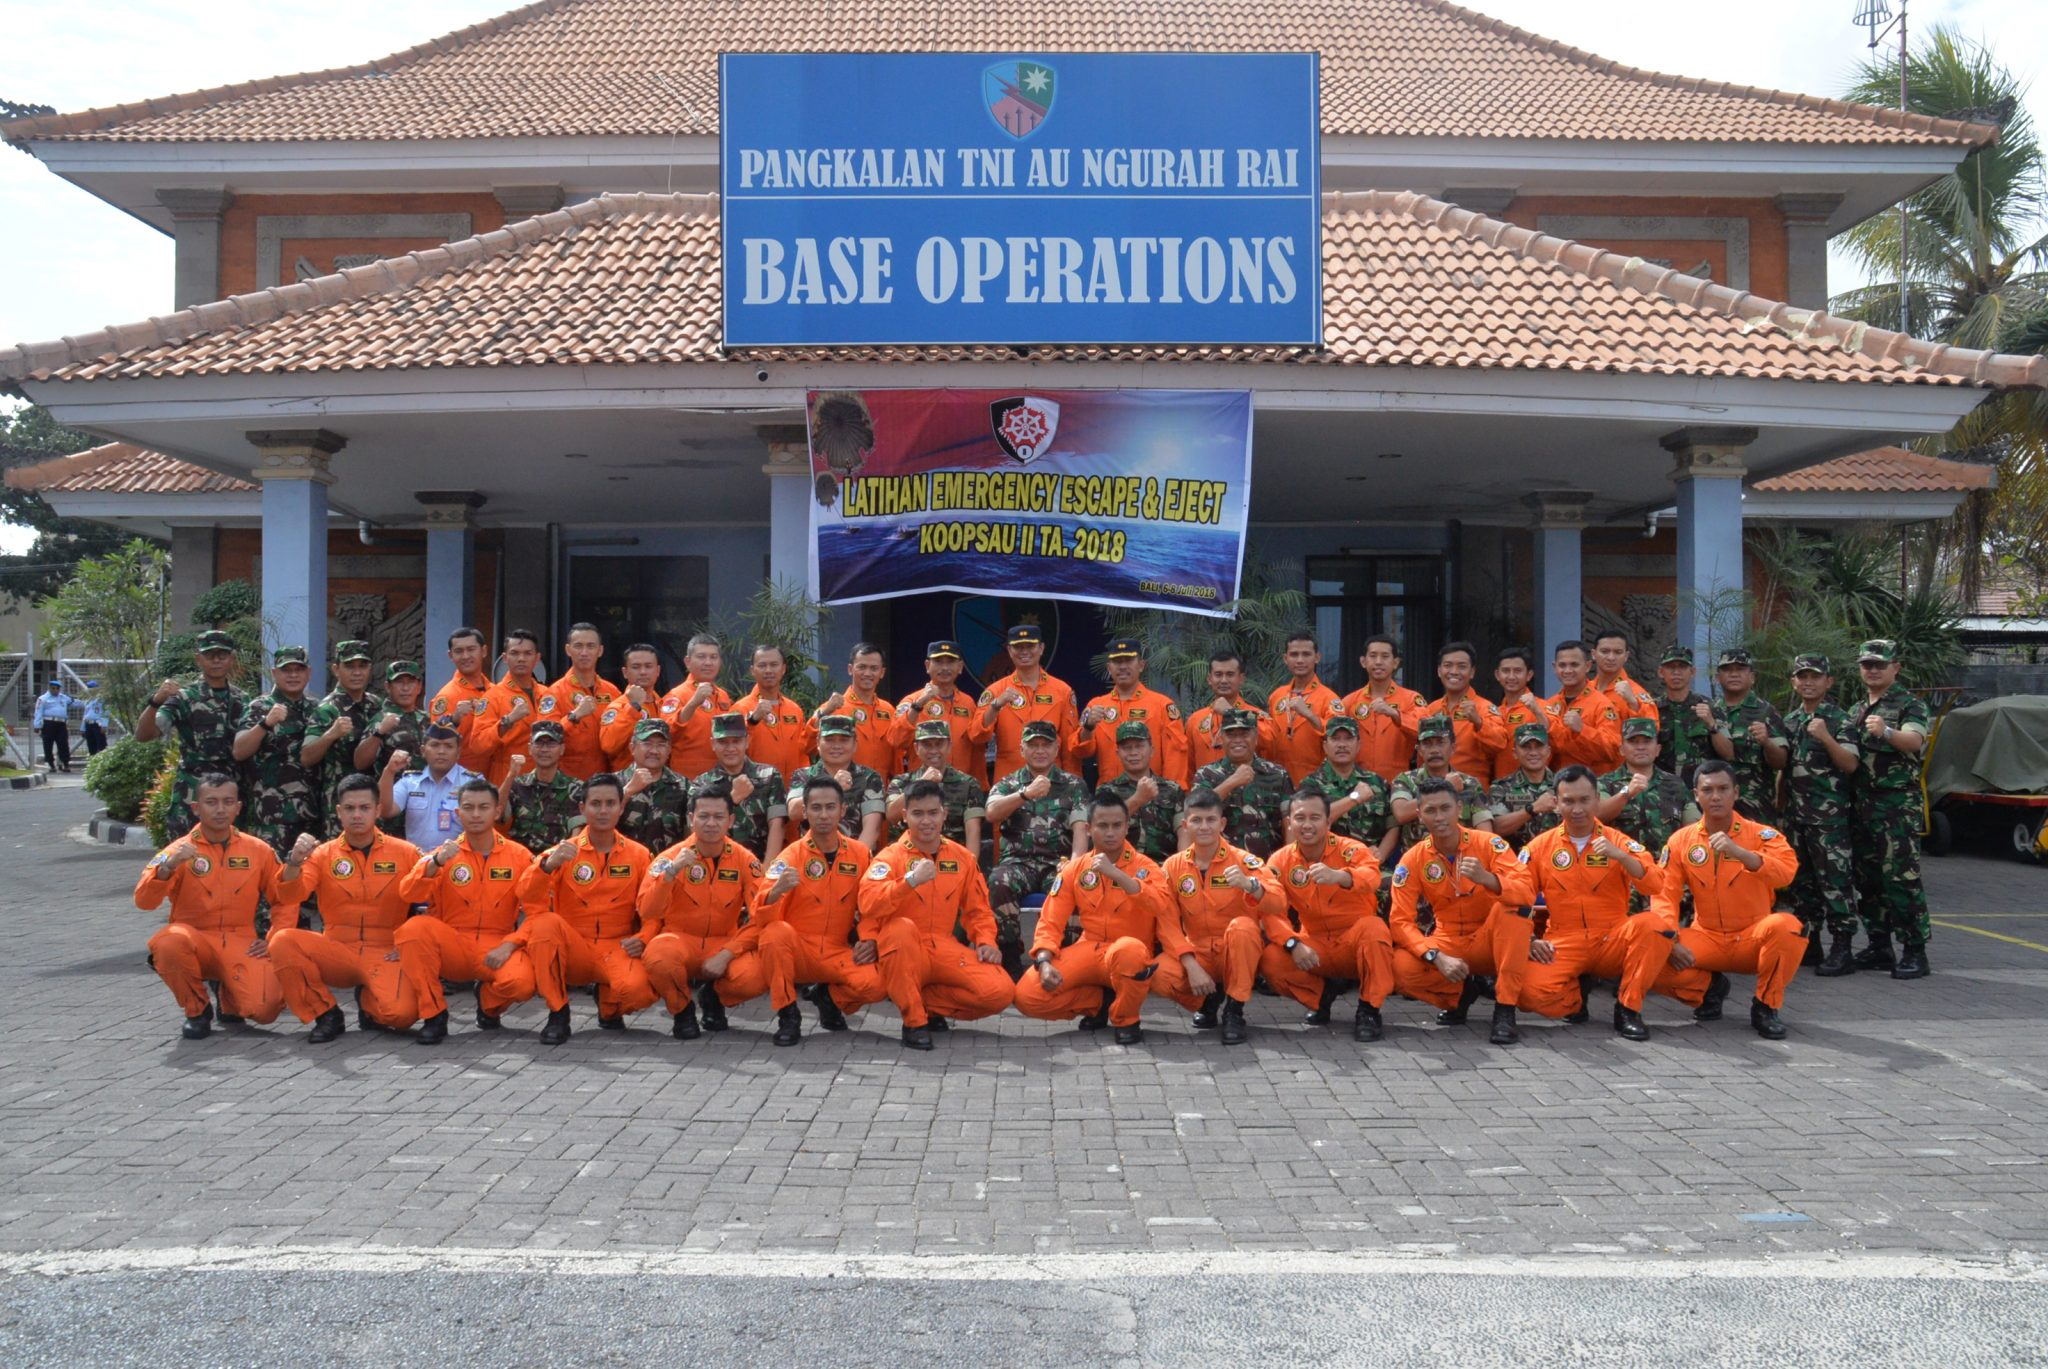 Pangkoopsau II Buka Latihan Parasailing Penerbang tempur Di Bali